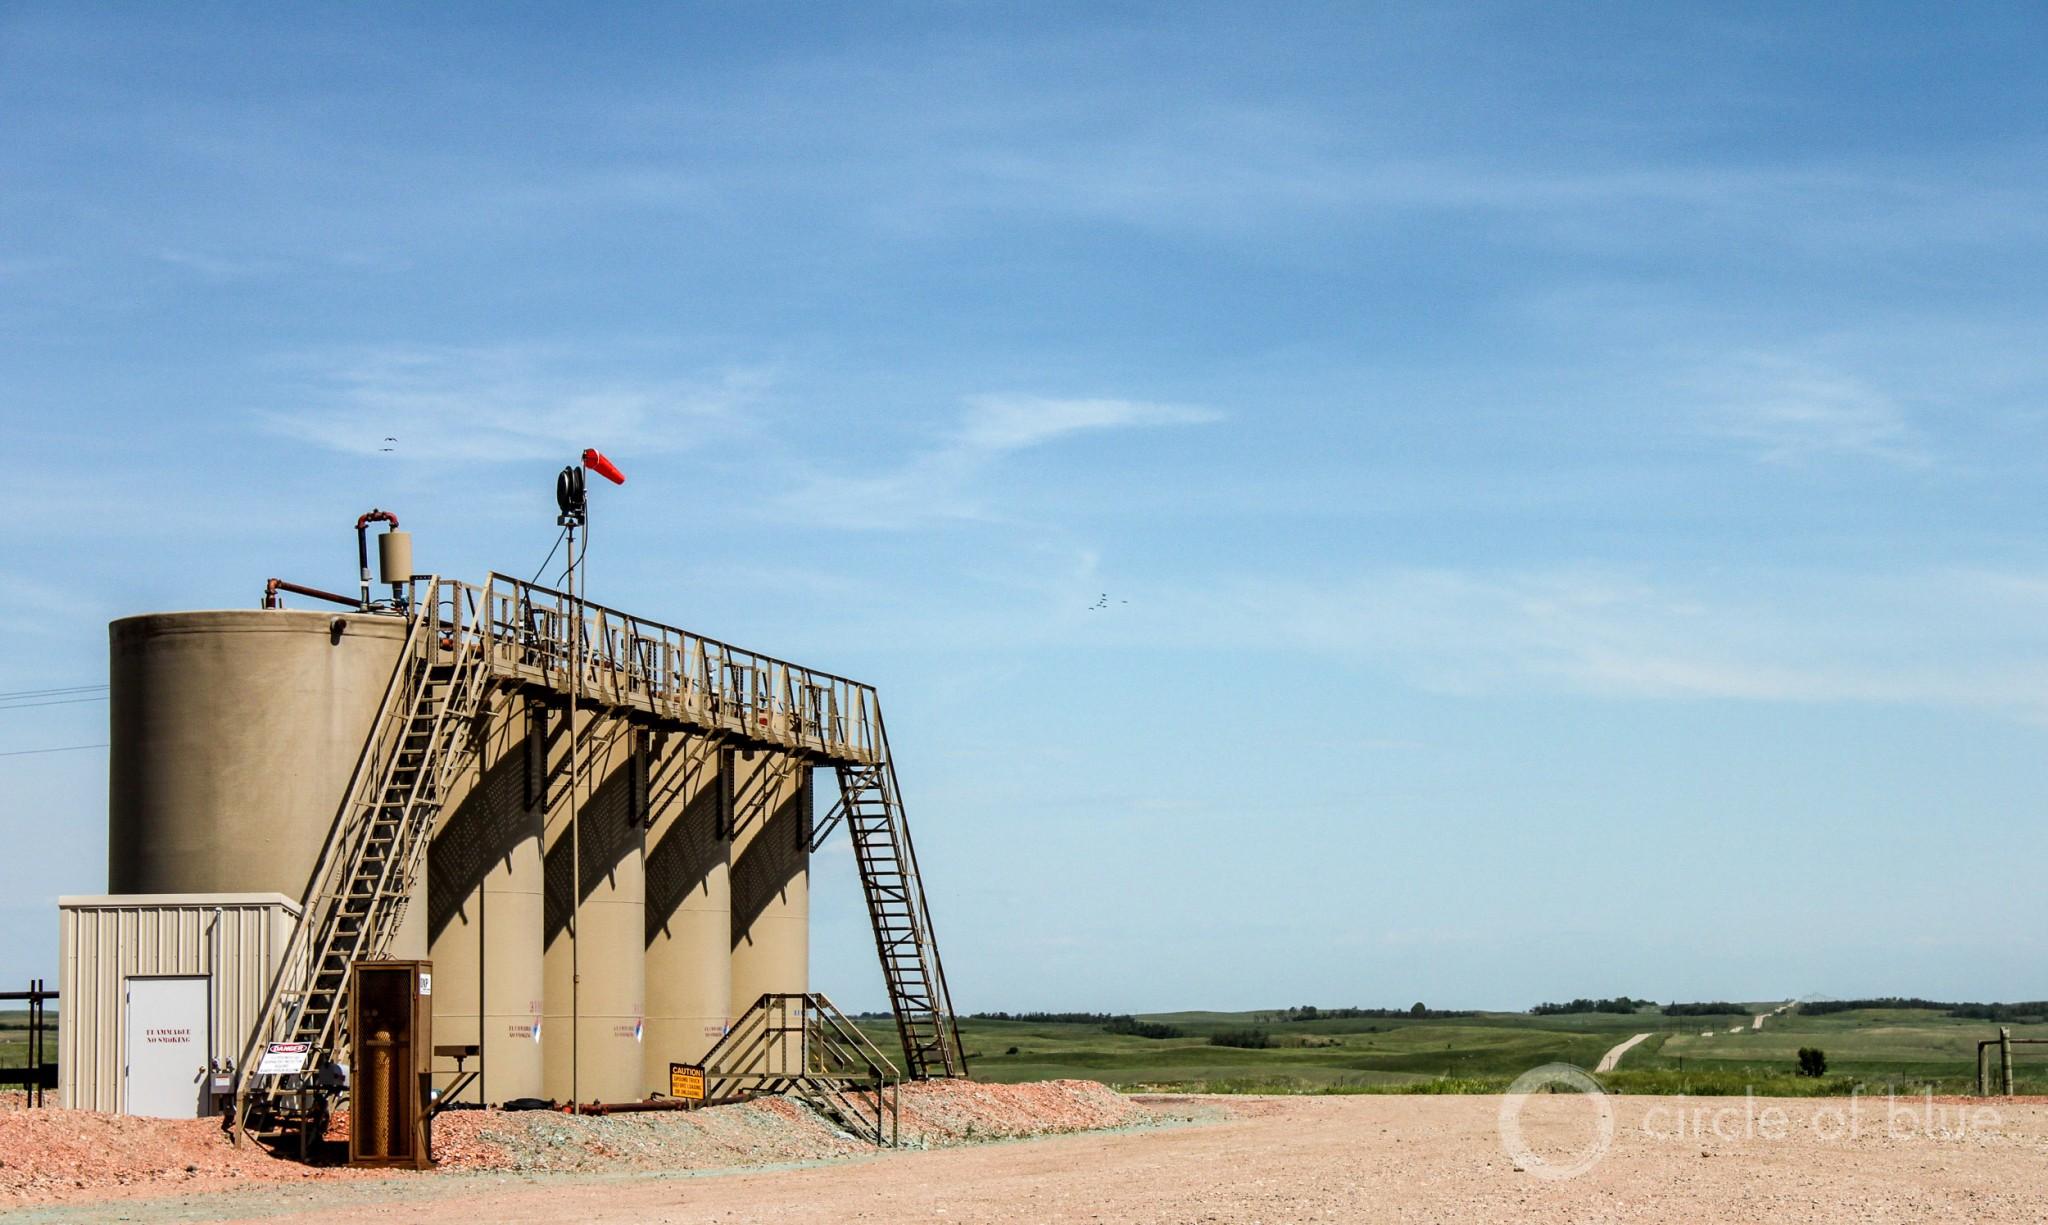 The Dakota Access pipeline would carry 500,000 barrels of crude oil a day from North Dakota's Bakken oil field, one of the world's largest oil producers. Photo © Codi Kozacek / Circle of Blue